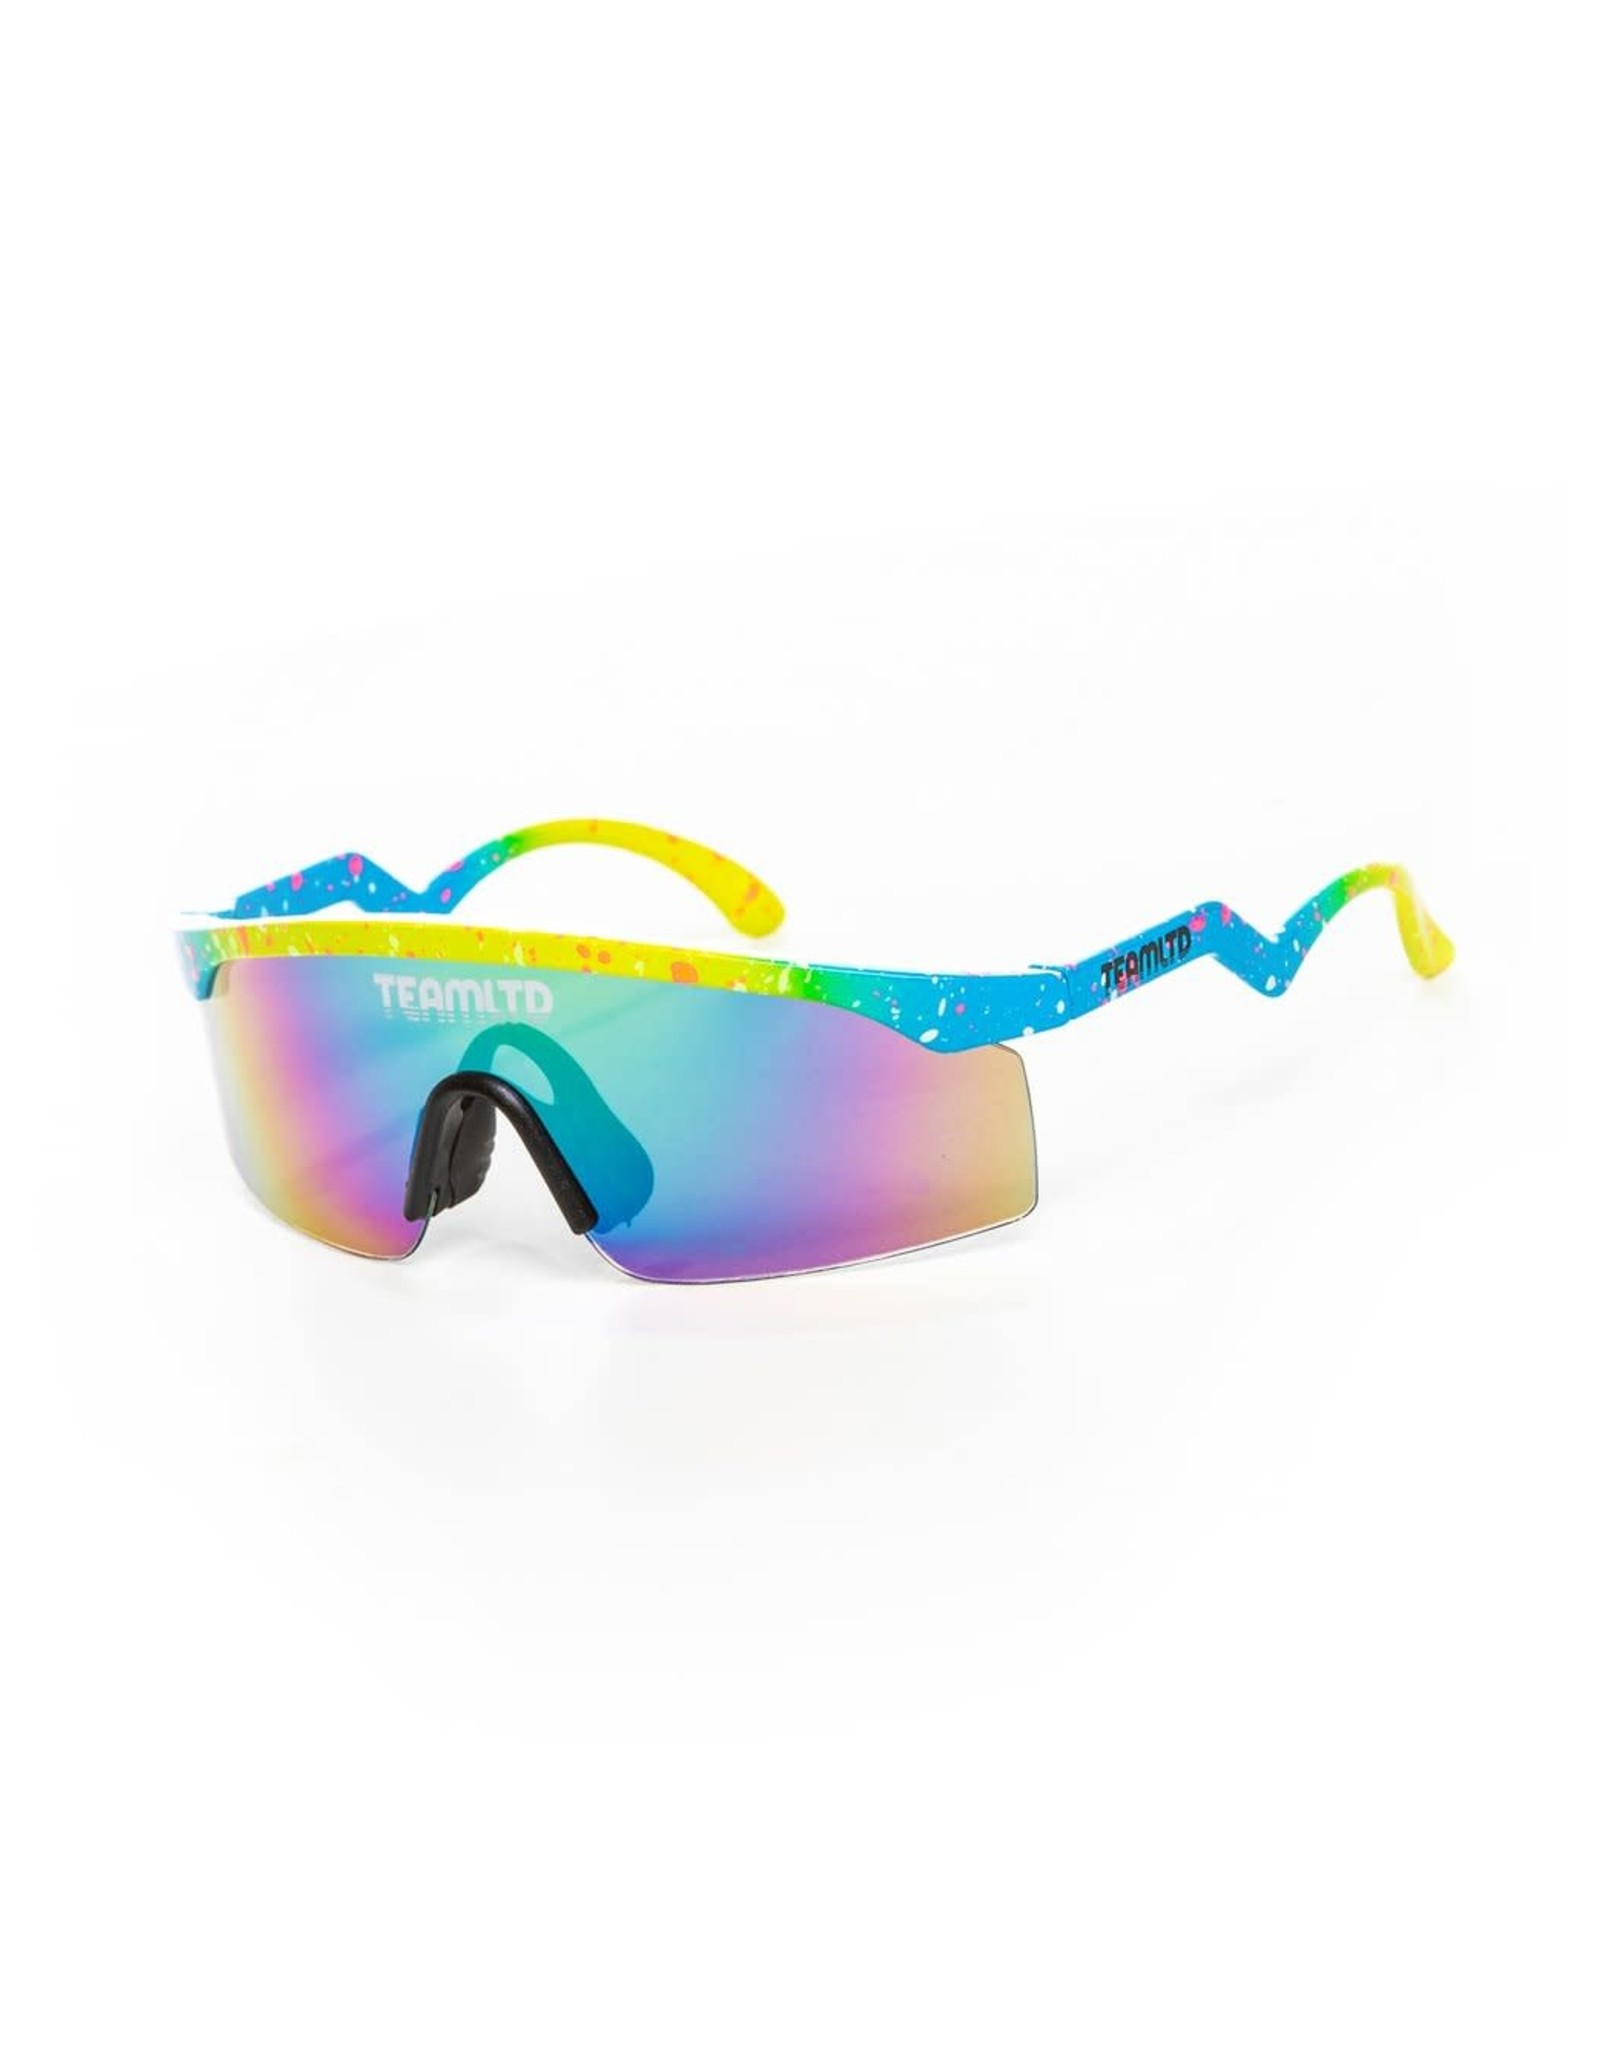 TEAMLTD Thrasher Sunglasses